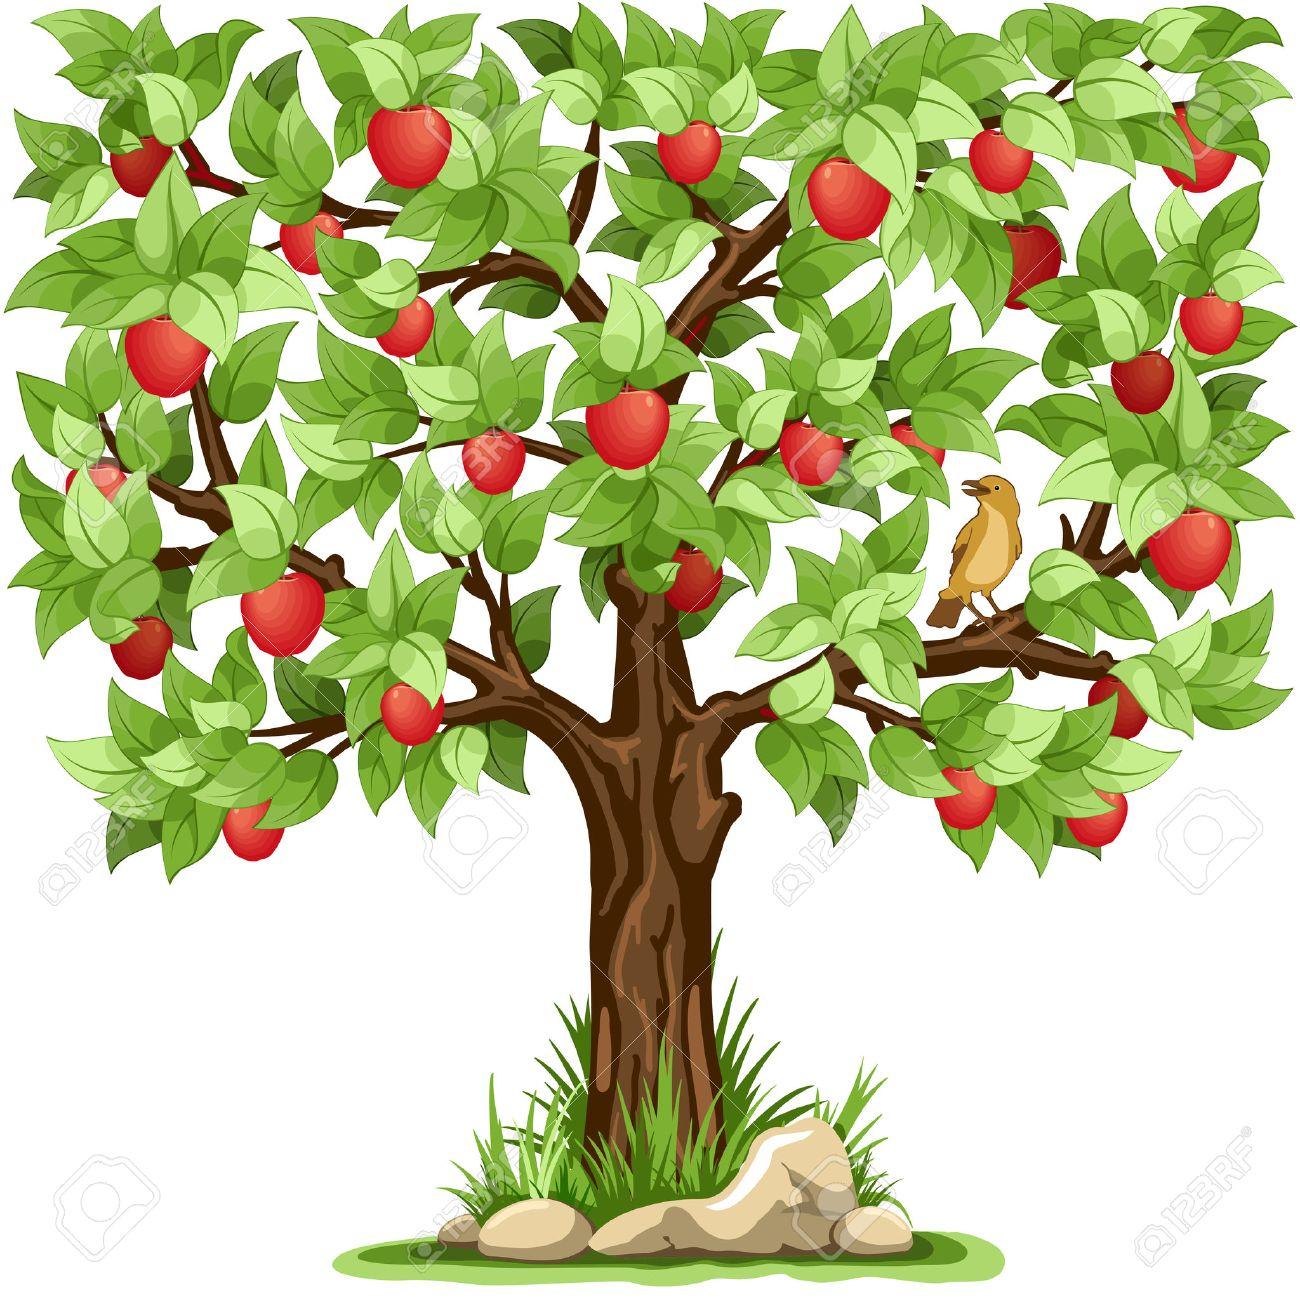 Cartoon apple tree isolated on white background - 55910312